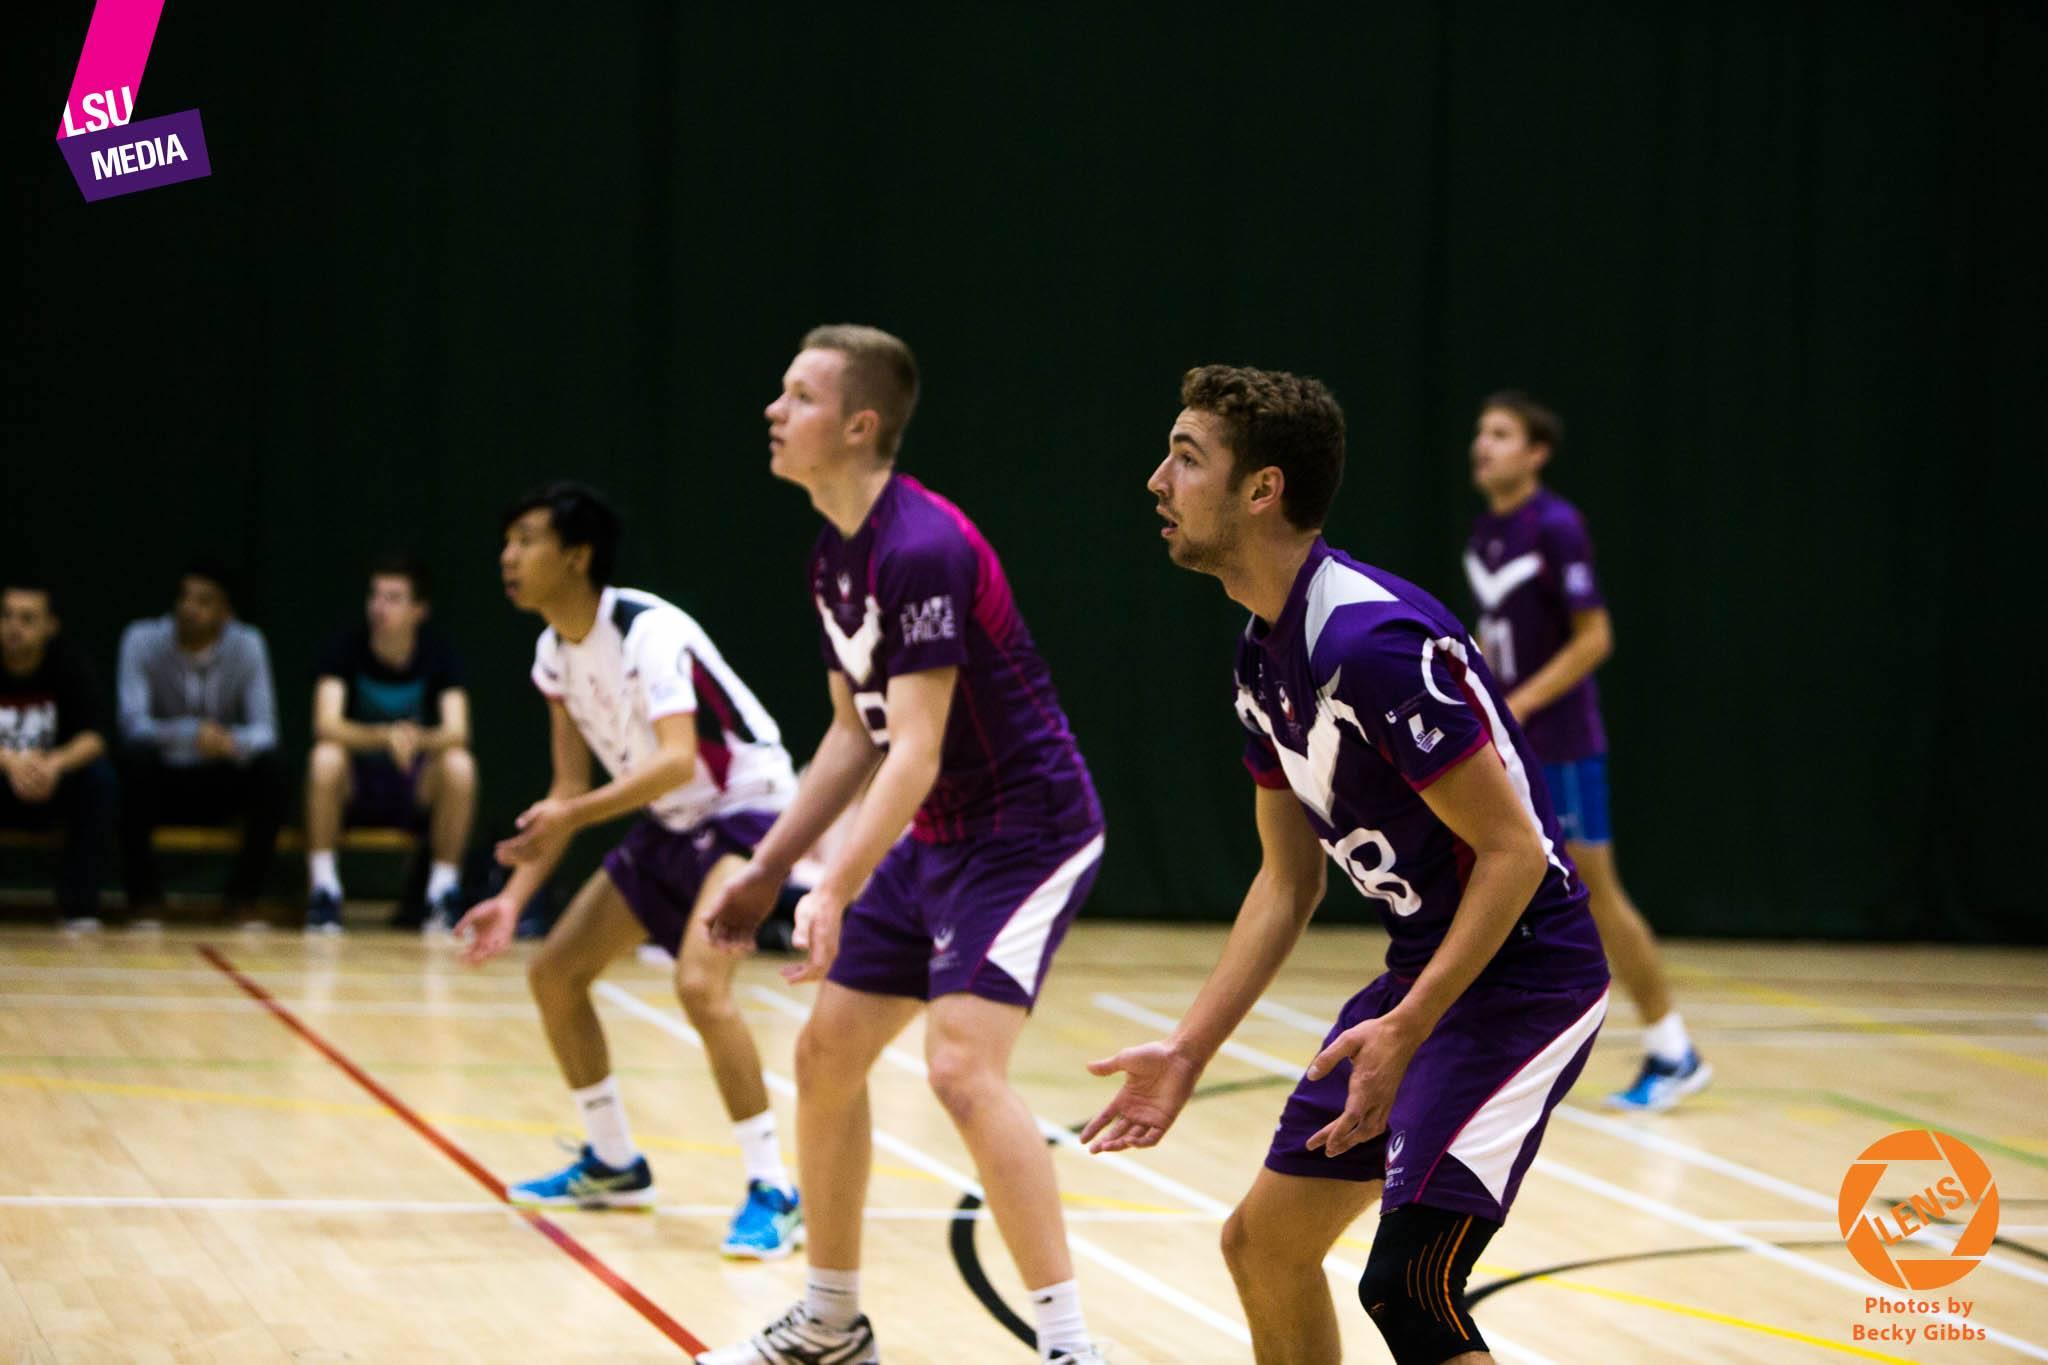 AU Volleyball l Focus Series